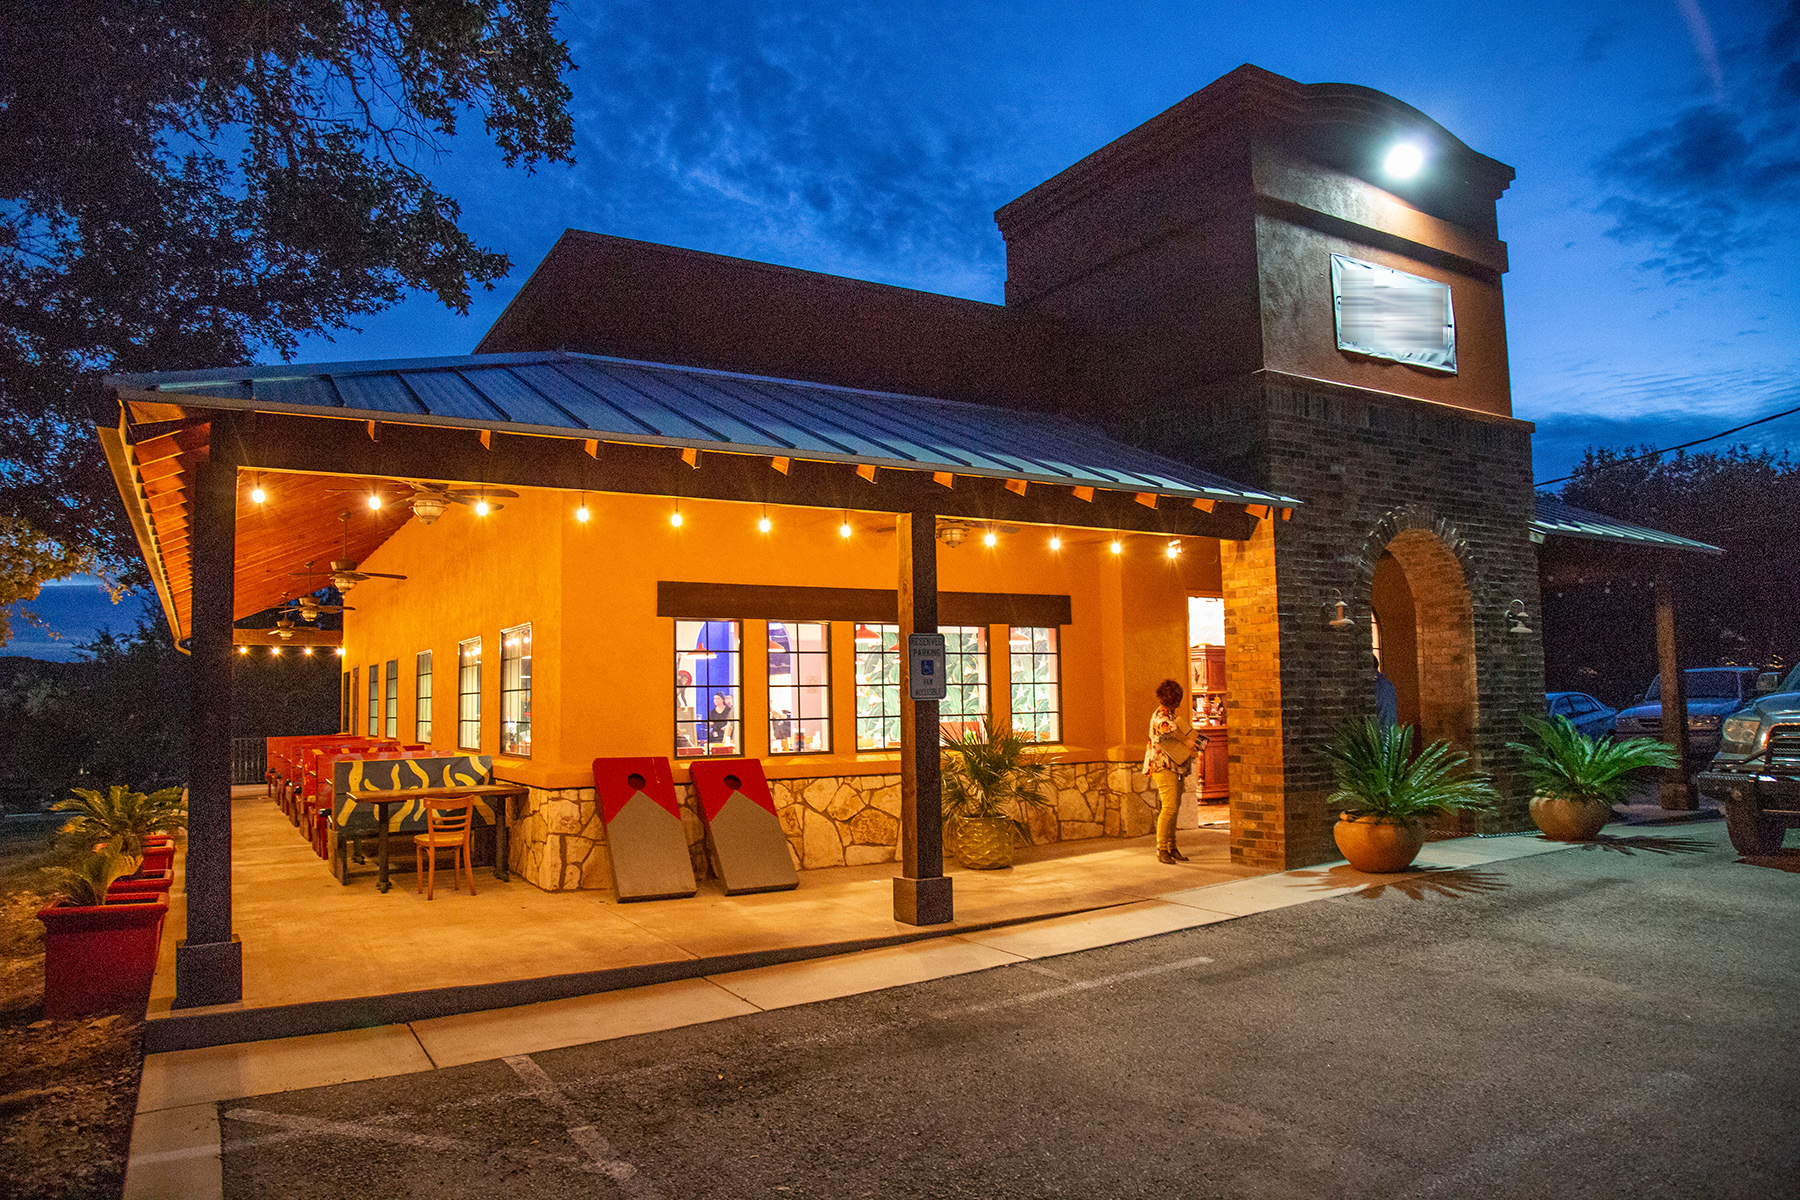 El Rey Tex Mex Restaurant - Lake Travis TX